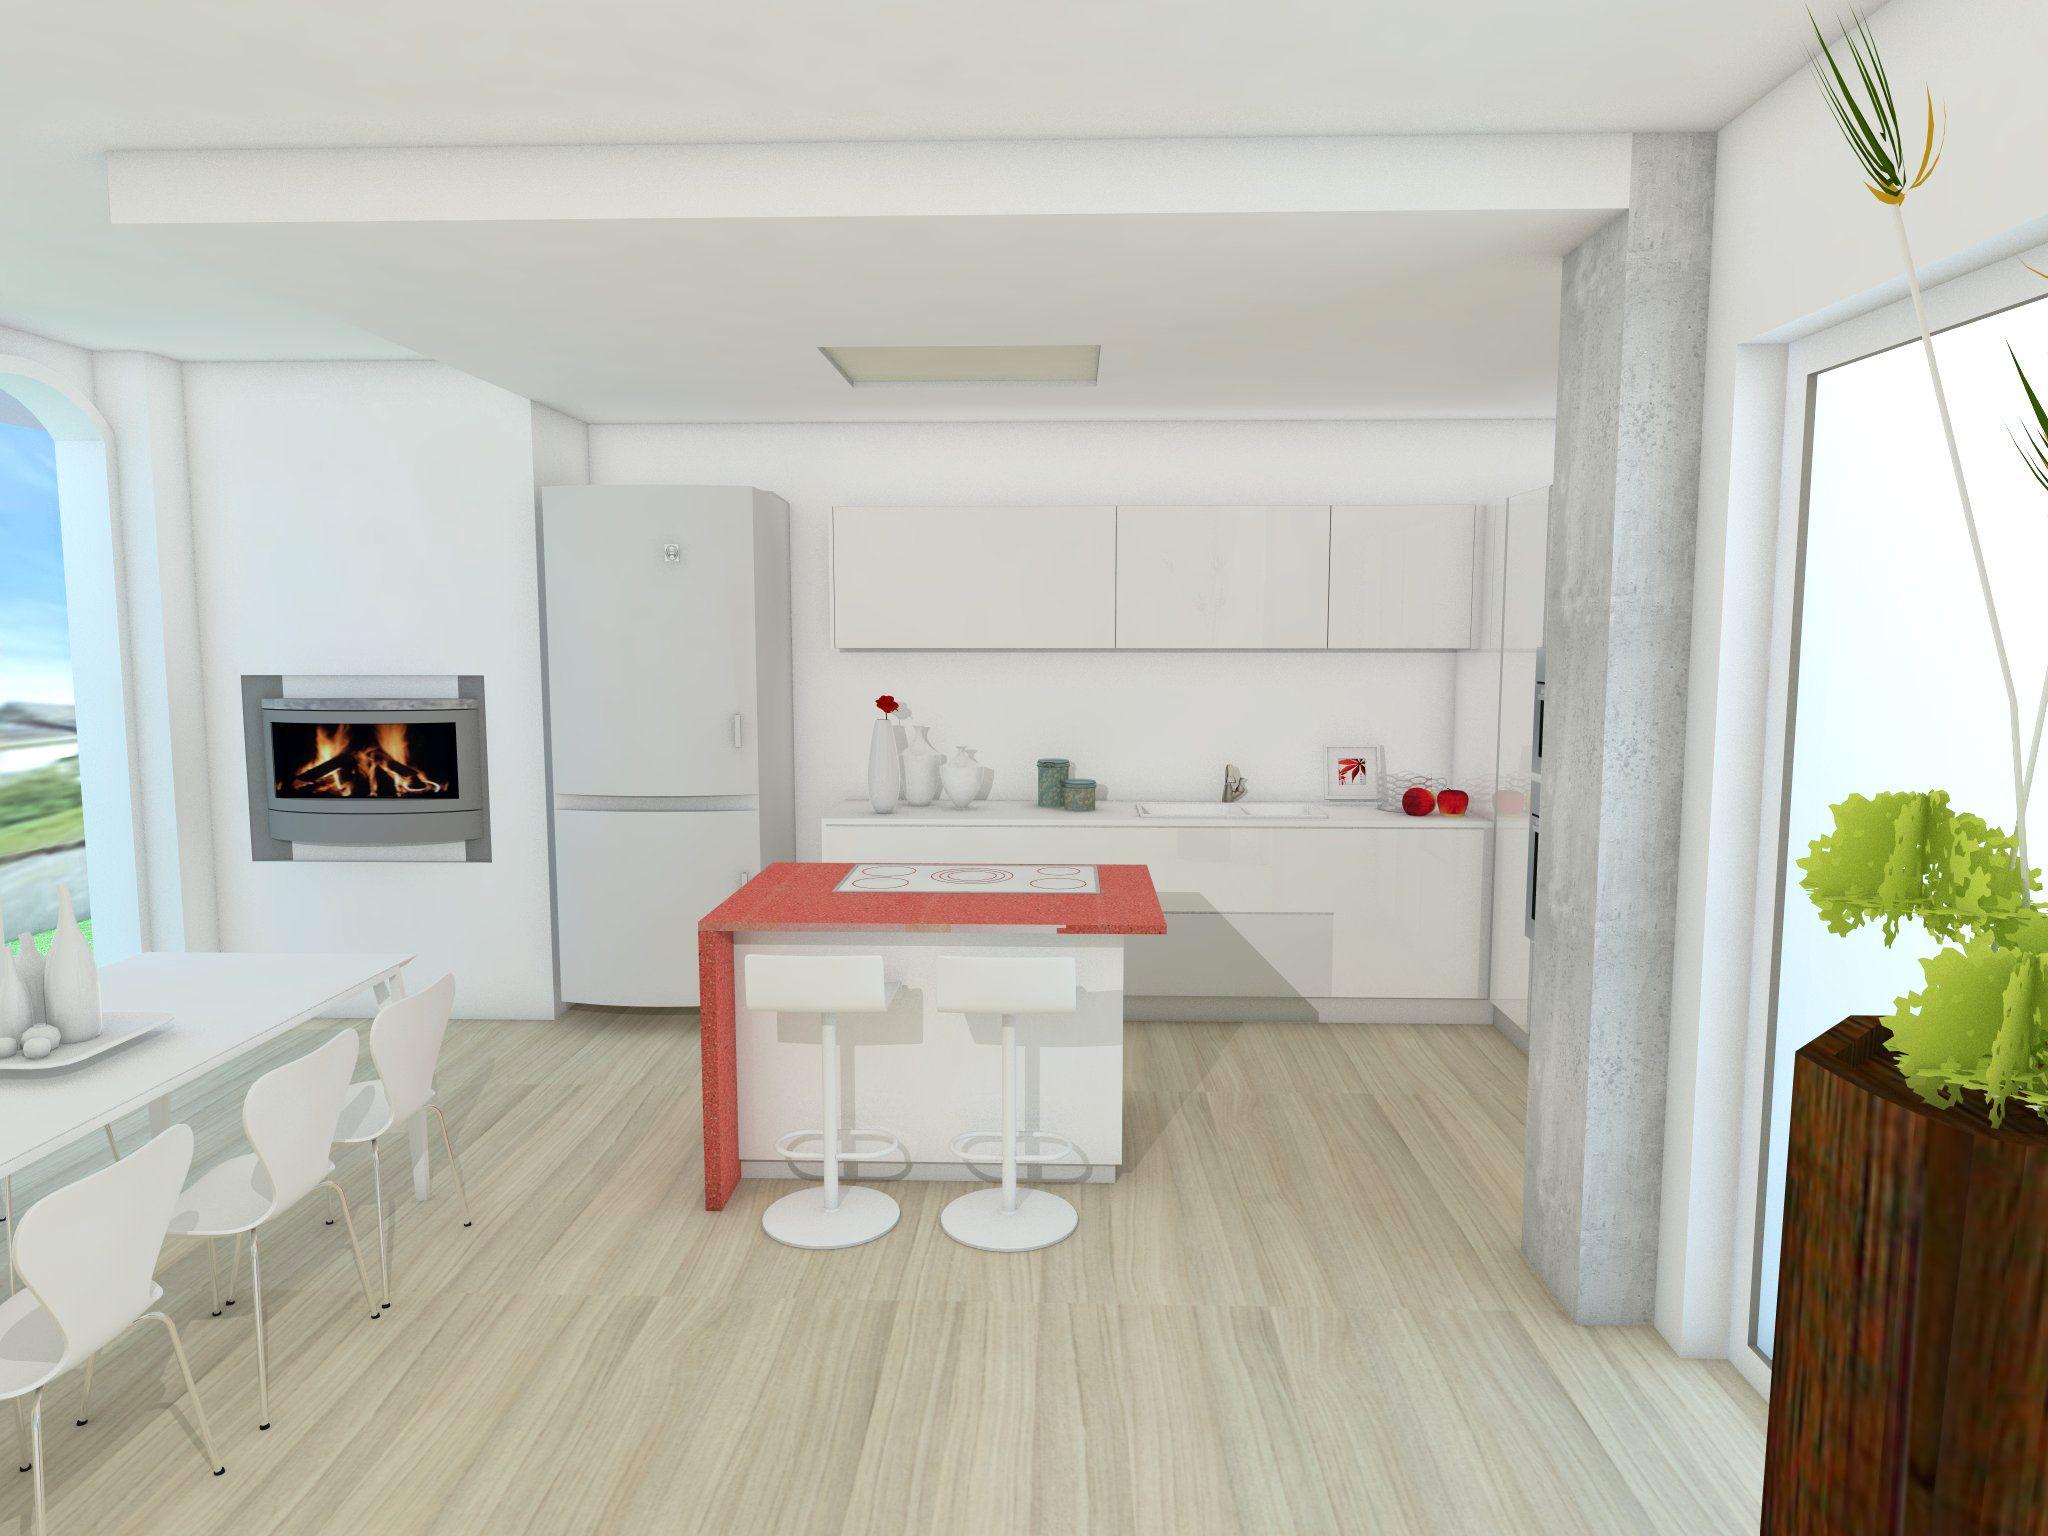 Cucina In Muratura Cartongesso | In Cartongesso Per Arredamento Su ...